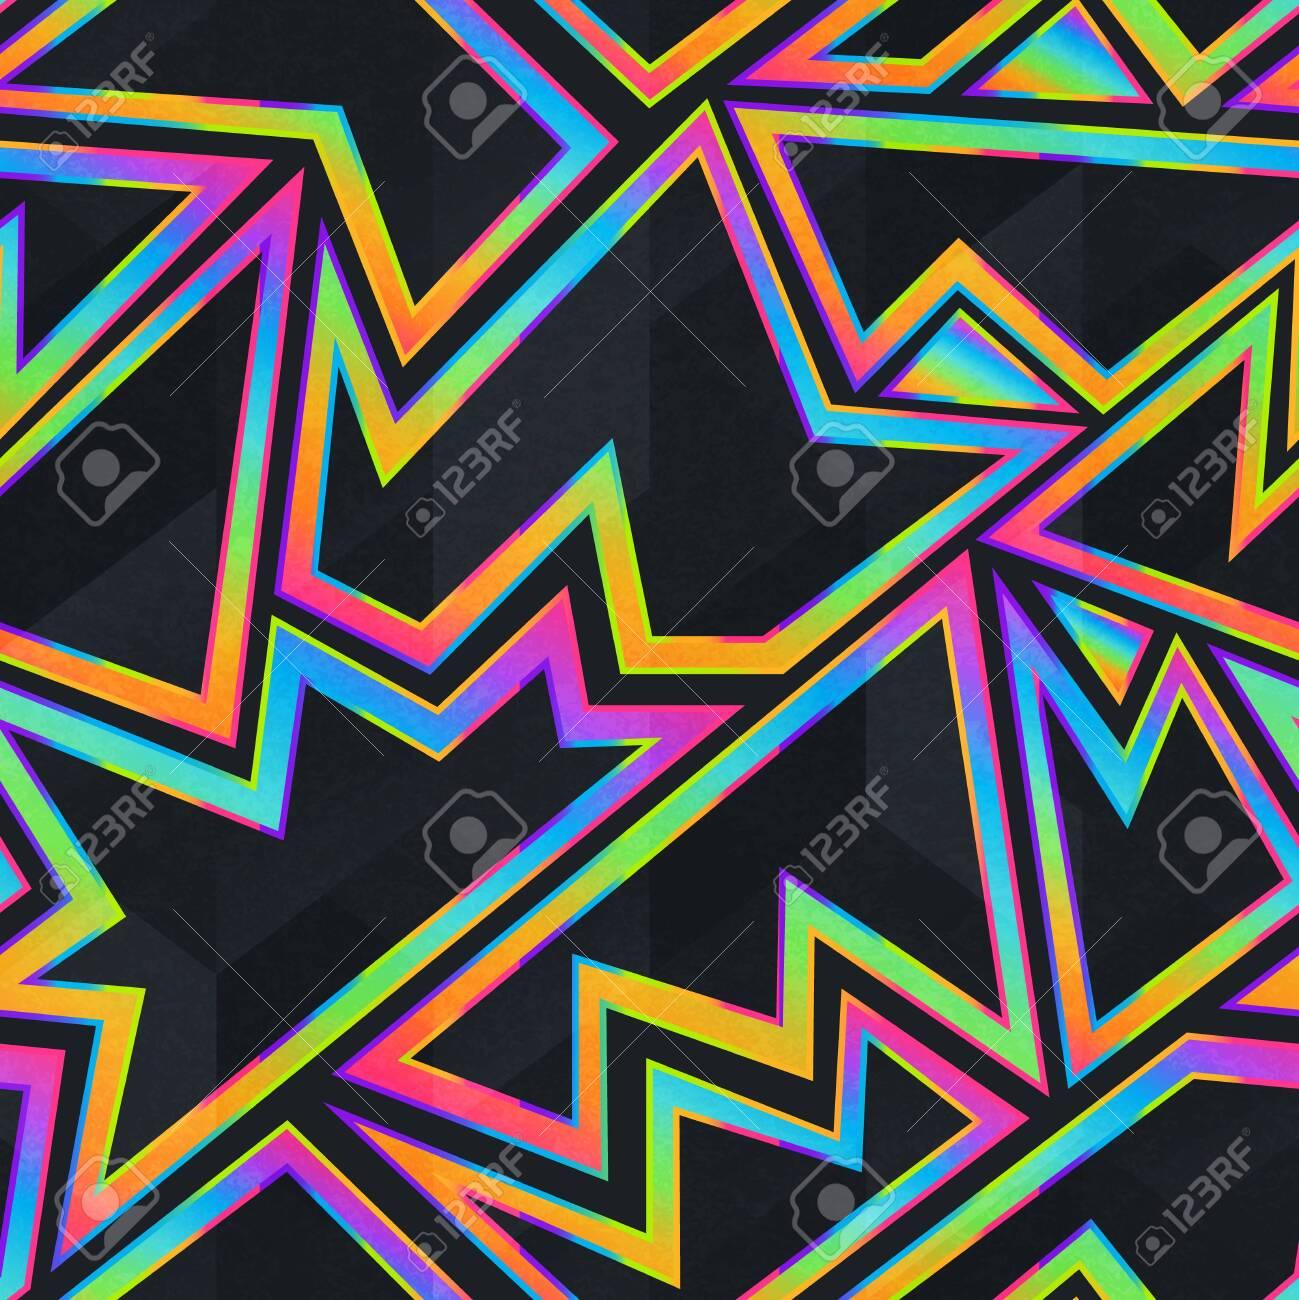 Bright neon geometric seamless pattern - 138512858